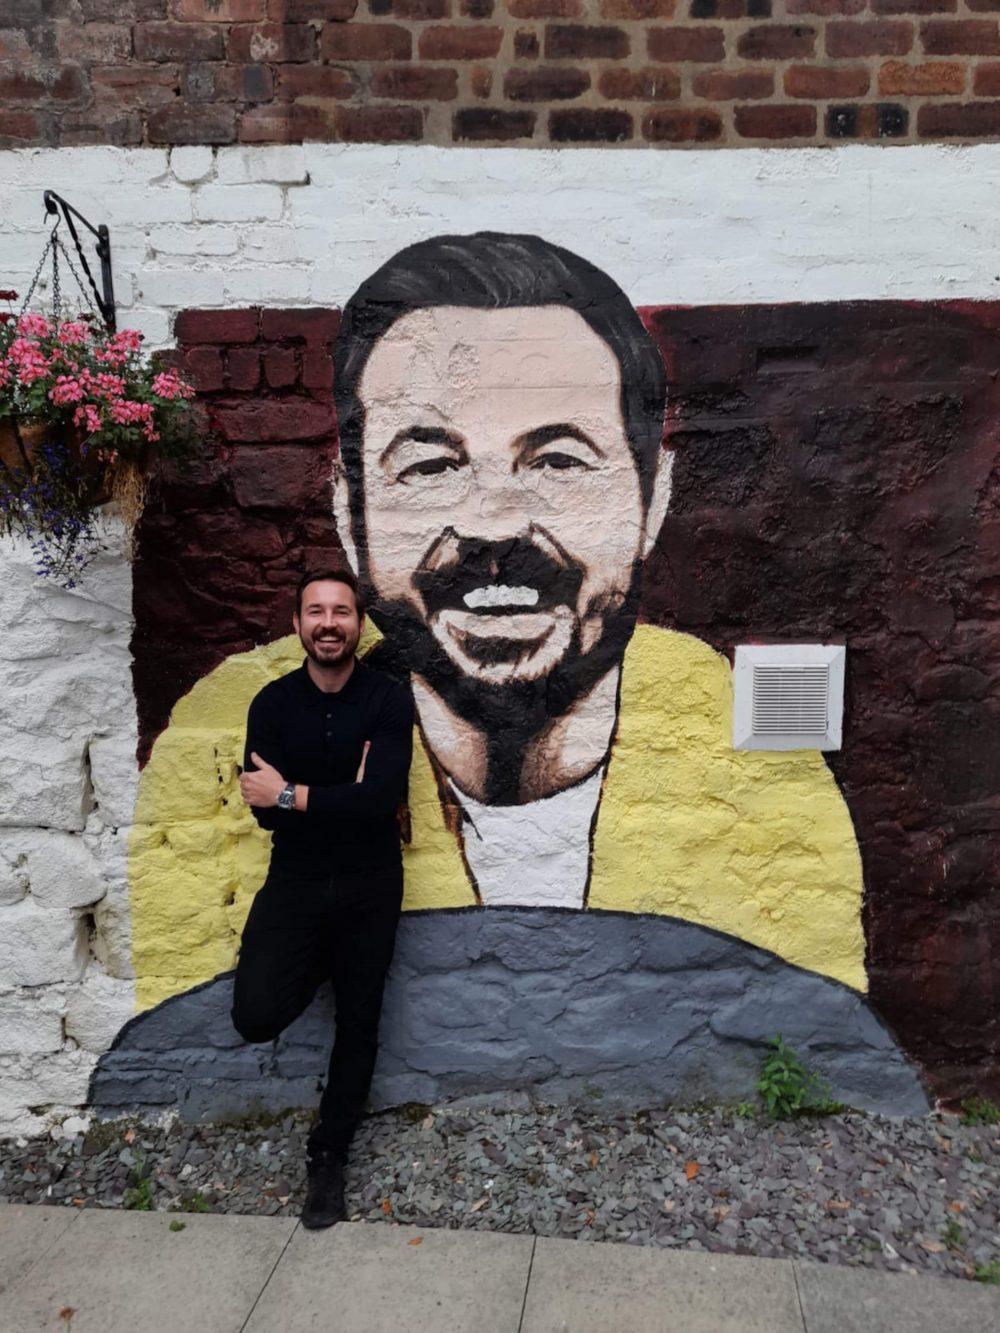 Martin Compston mural - Scottish News